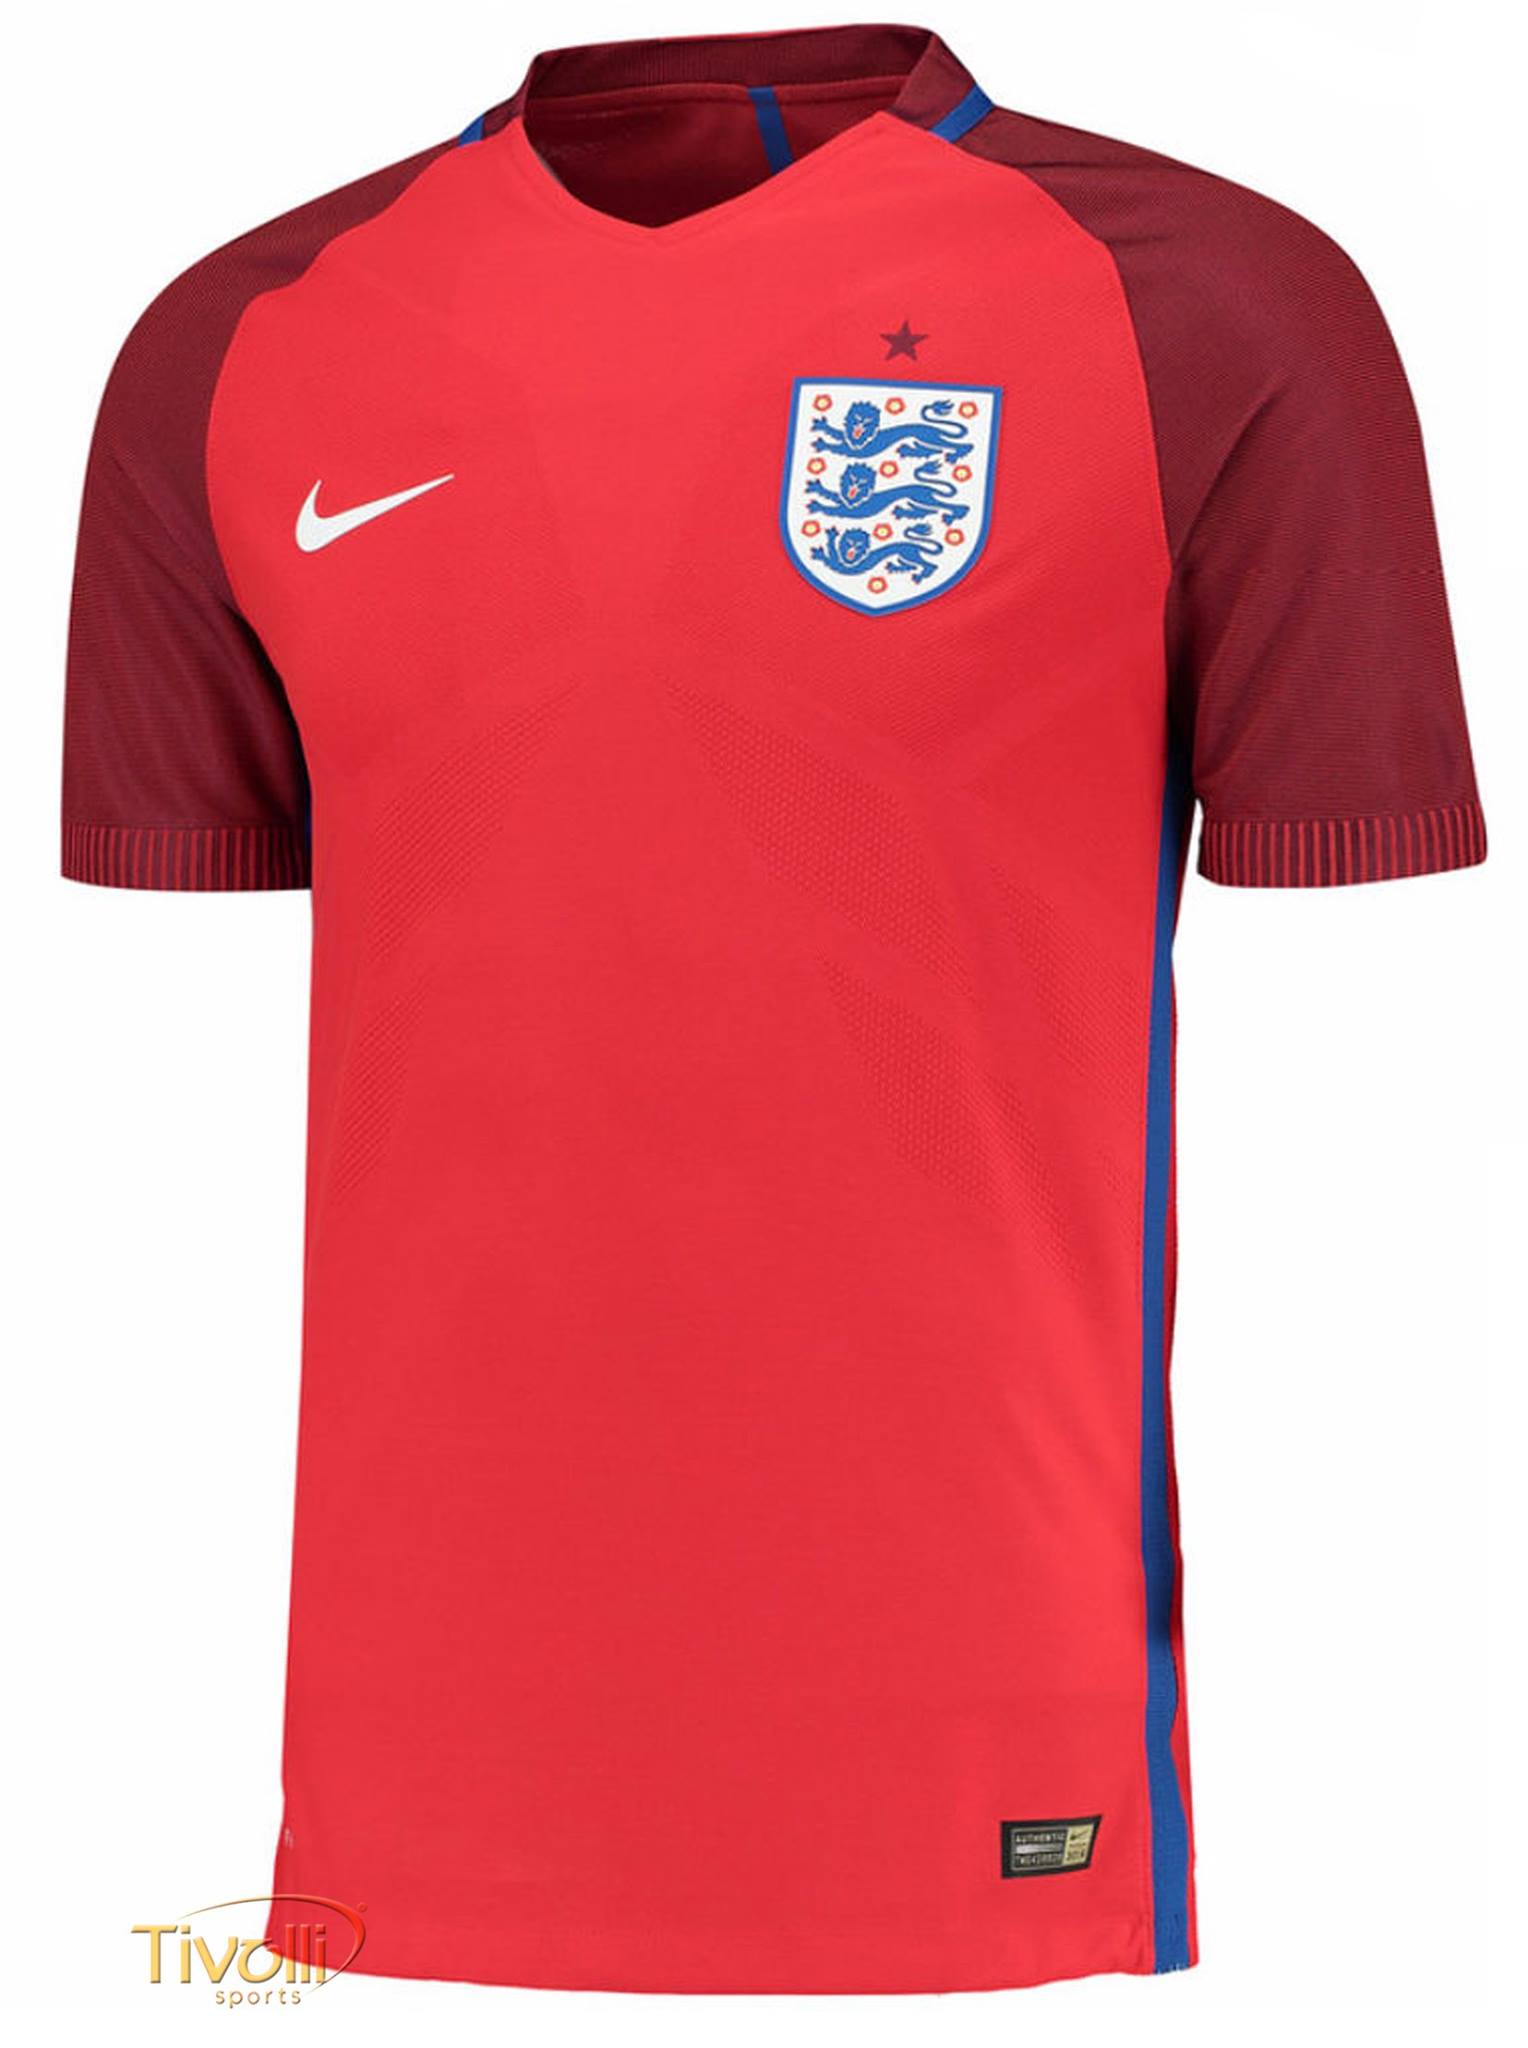 Camisa Nike Inglaterra II Away Masculina 2016   - Mega Saldão   d014a1d89f5bf